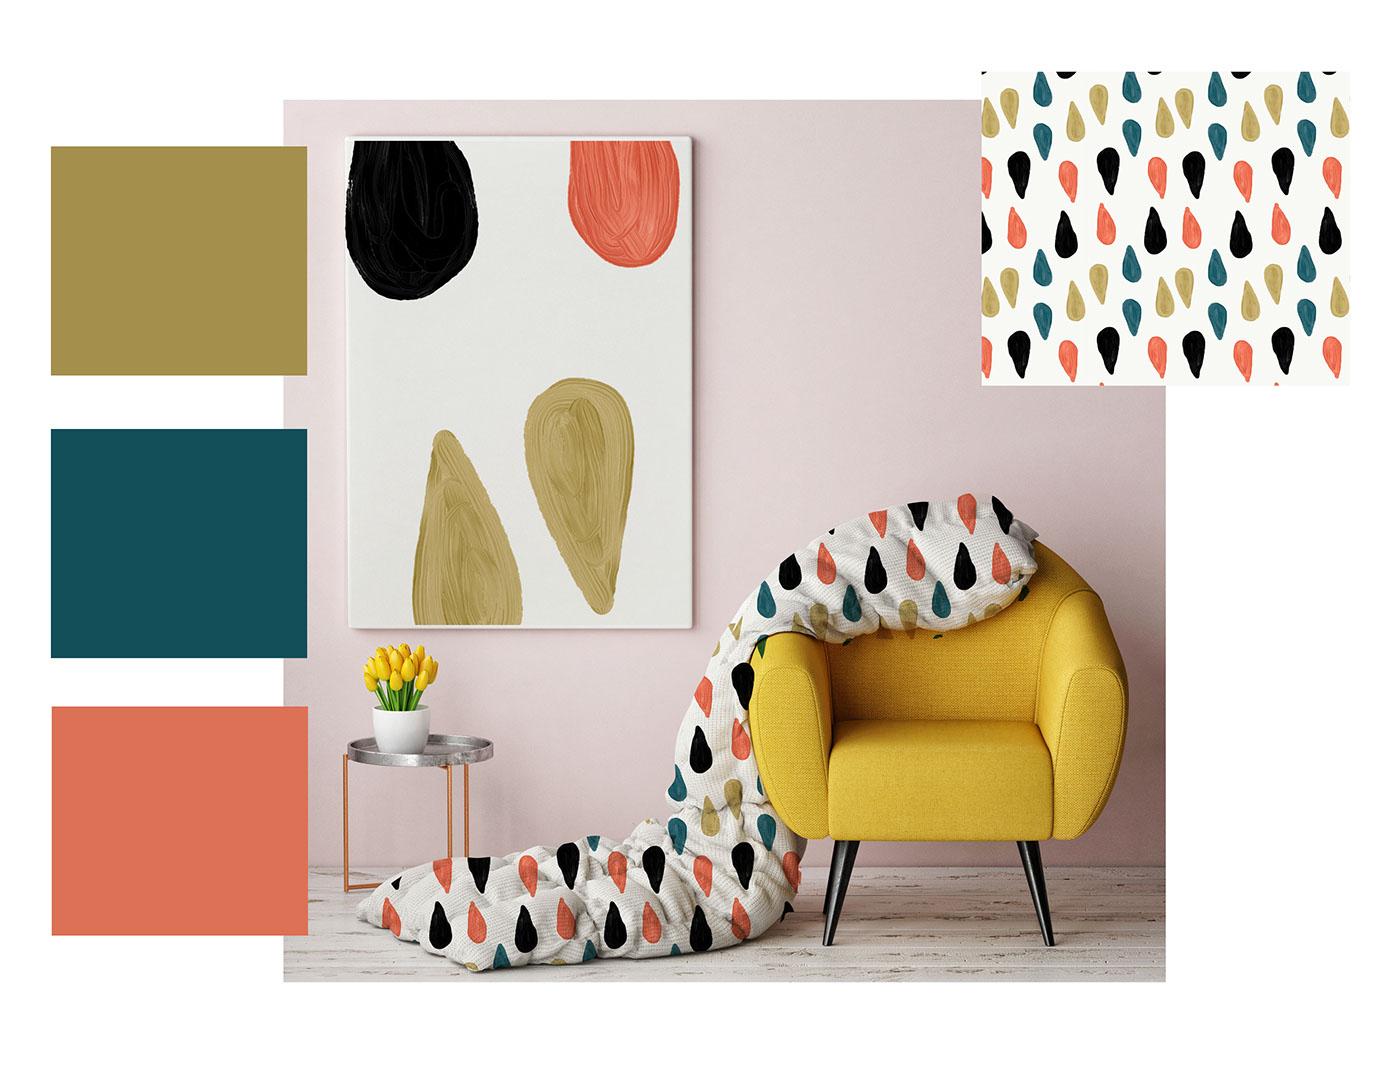 textile design Fashion  trend Interior prints pattern. graphic design  ILLUSTRATION